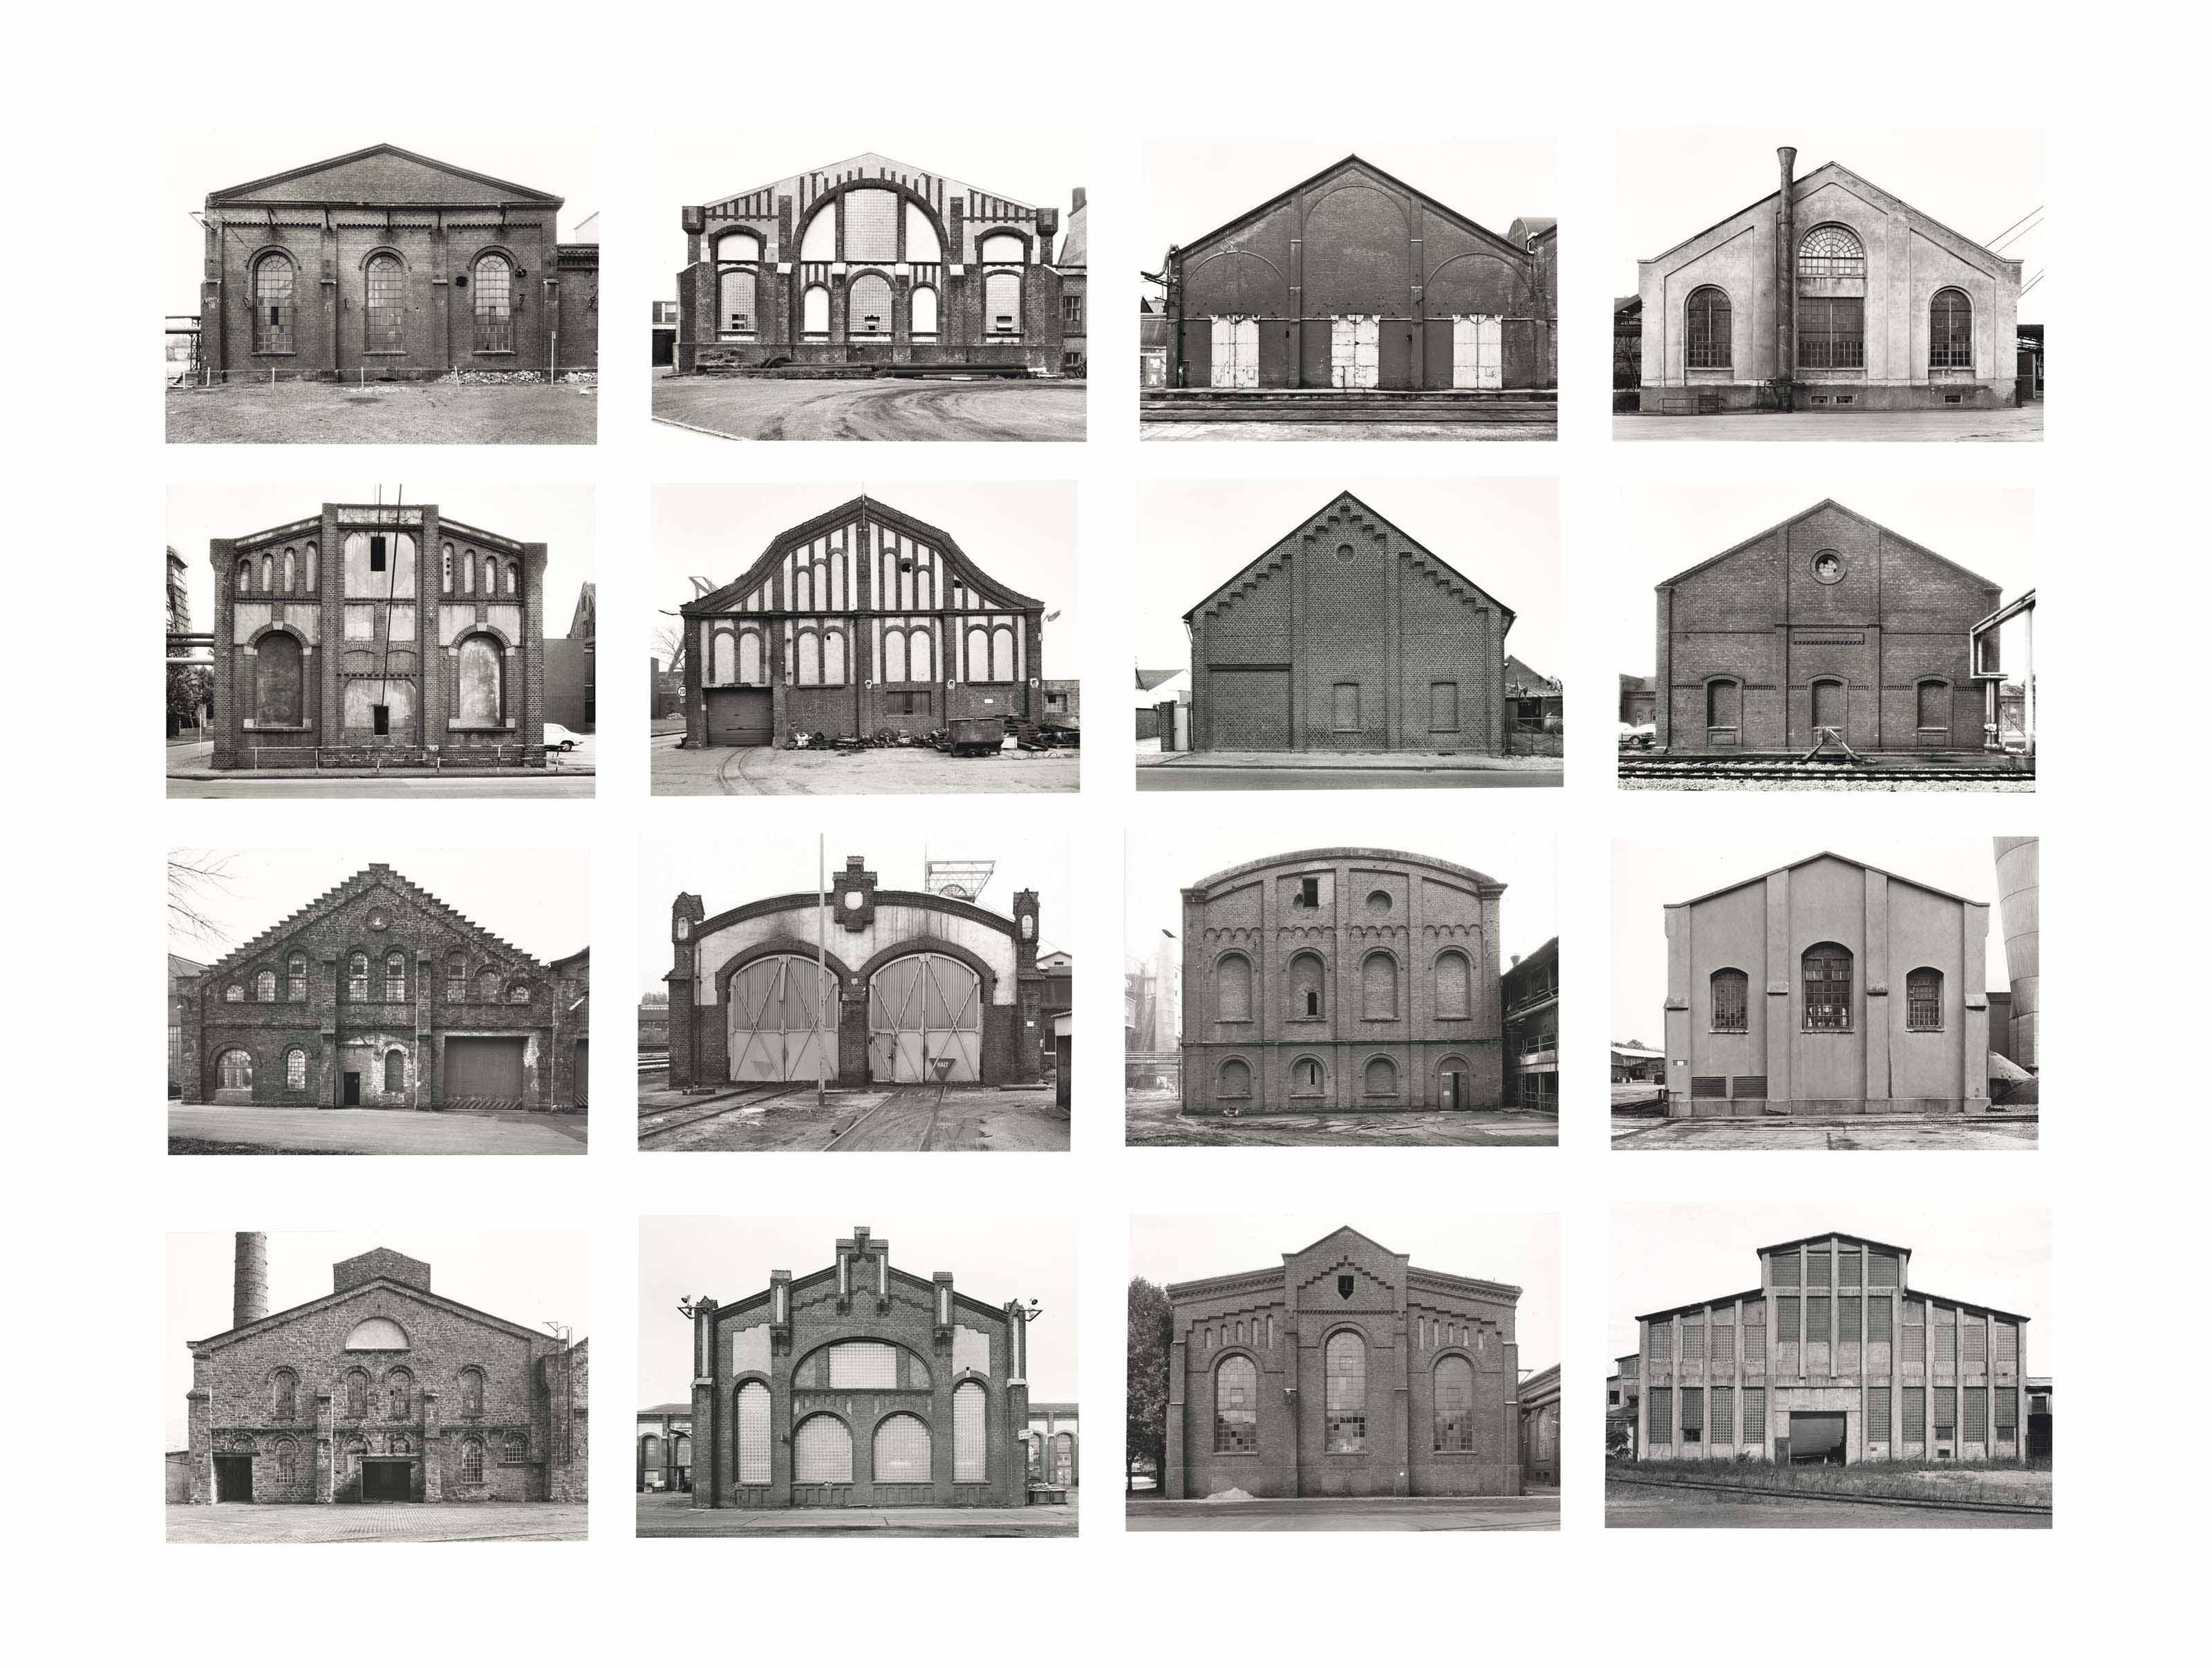 Fabrikhallen (Giebel)